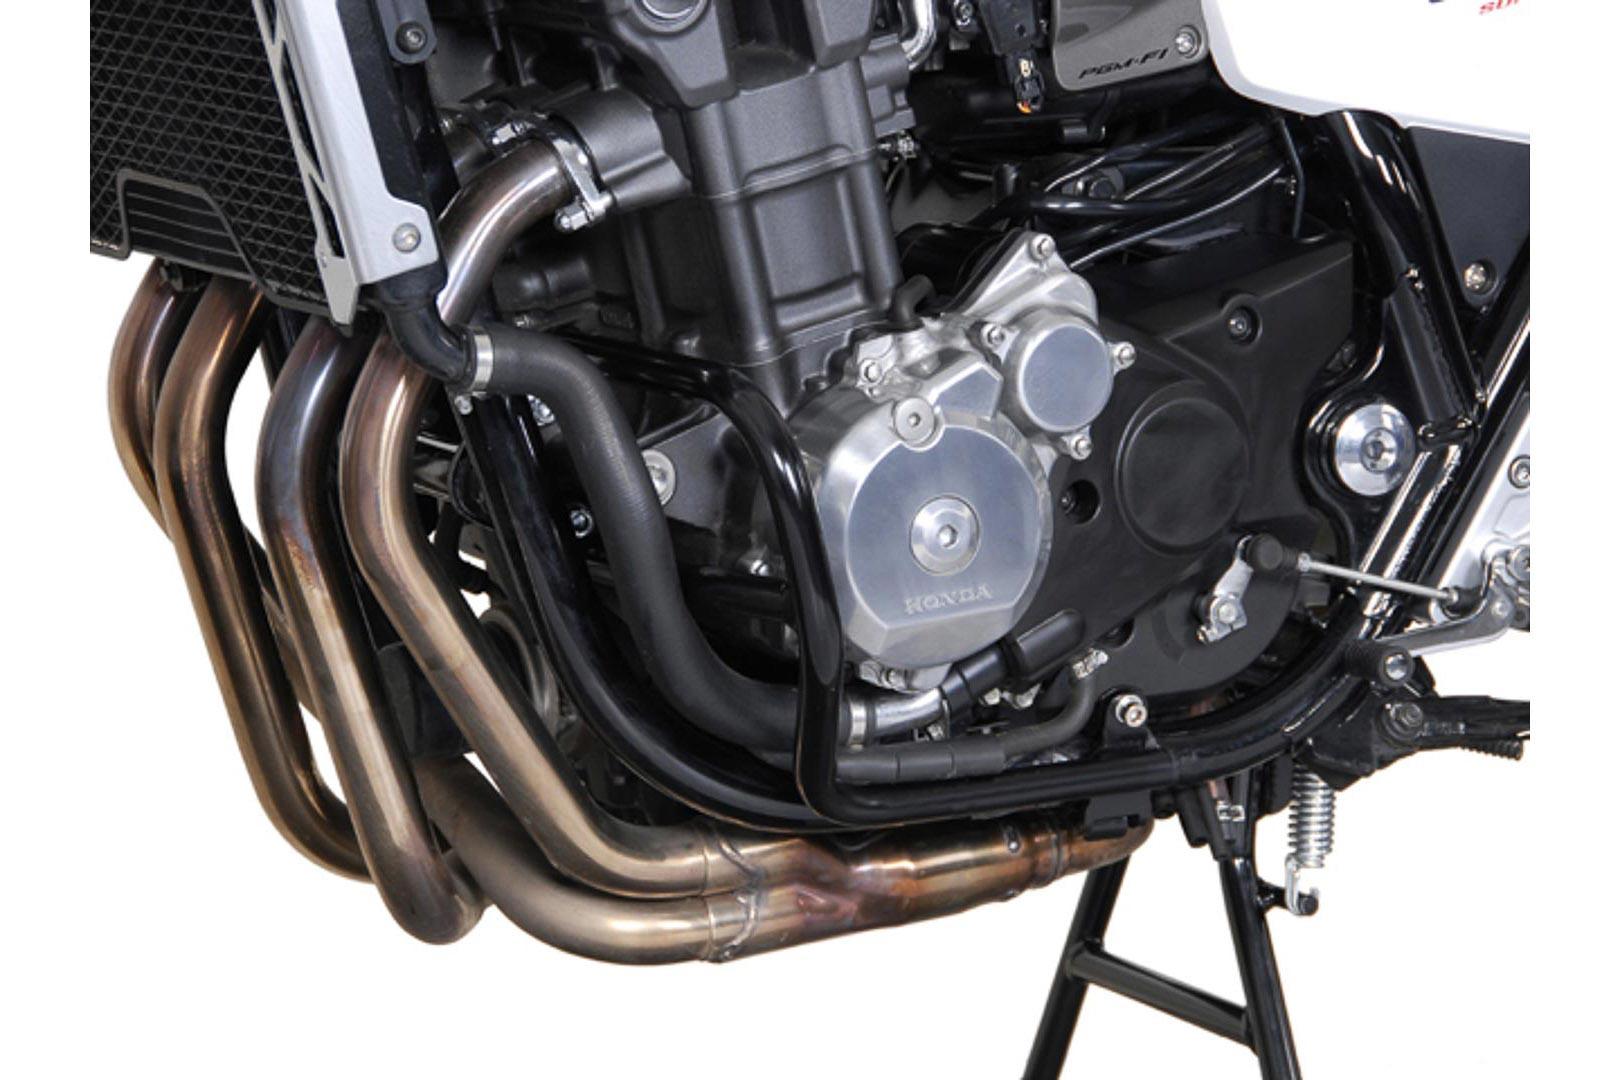 SW-Motech Moottorinsuojarauta Honda CB1300 musta